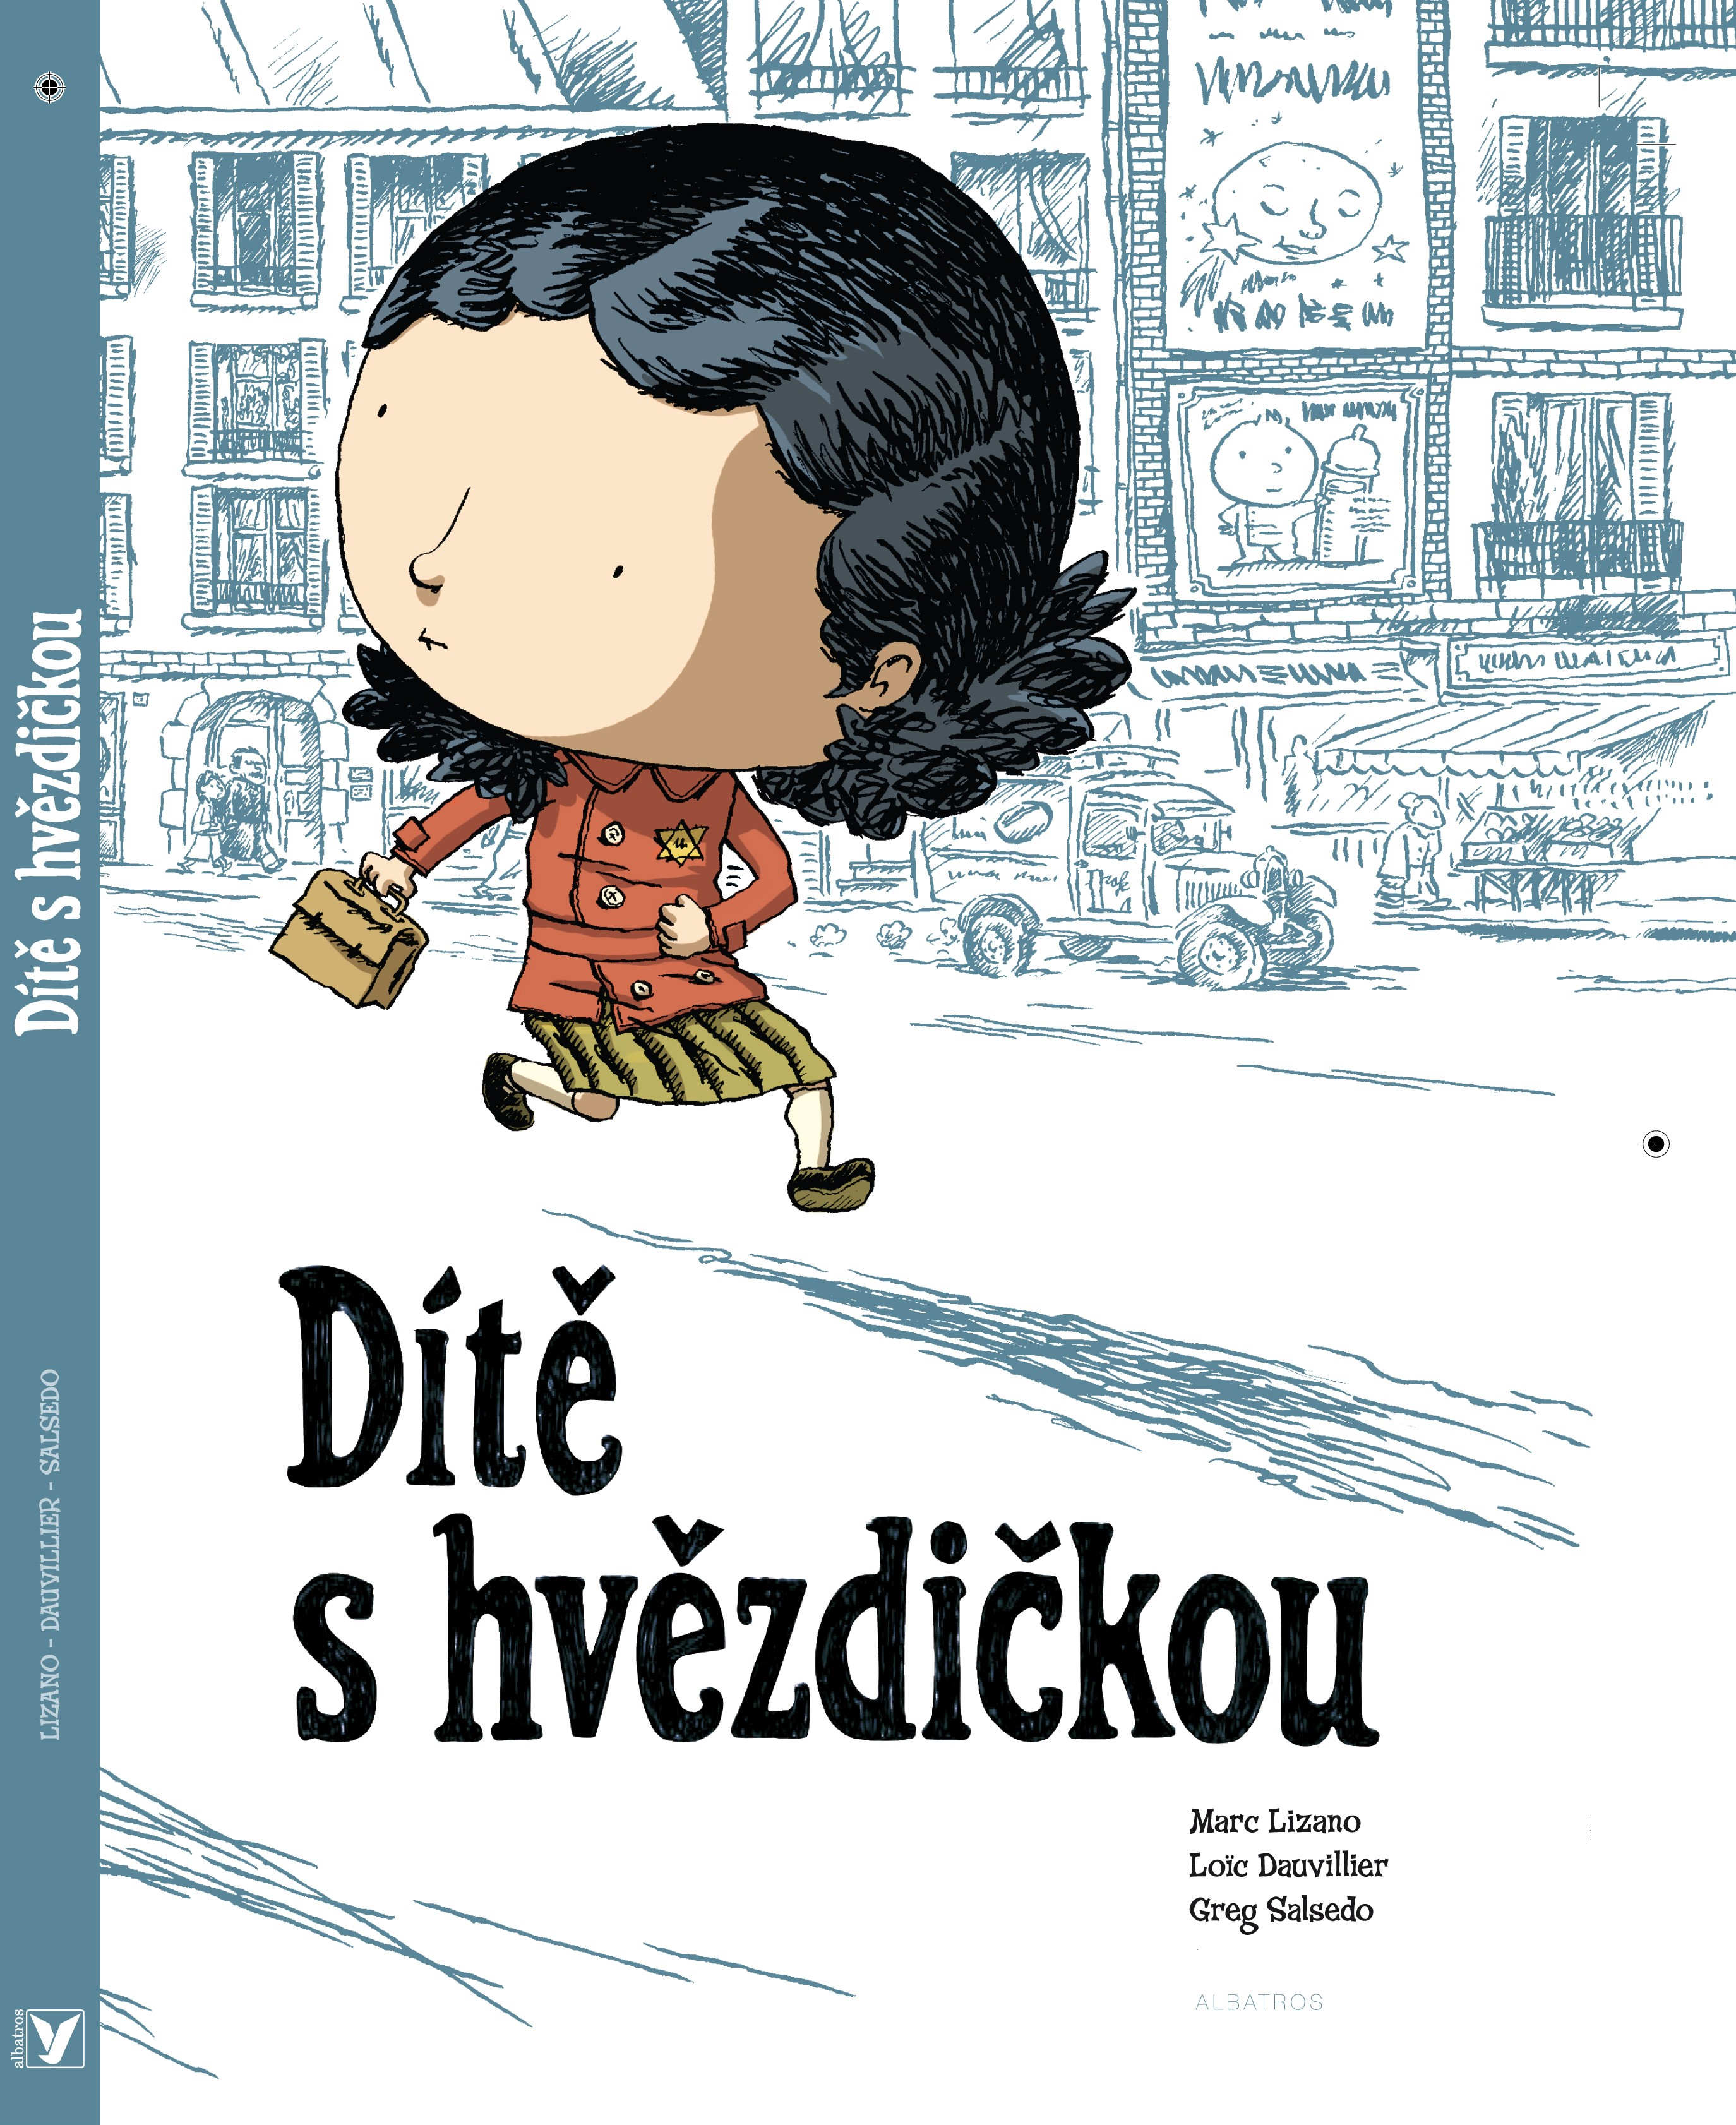 Dítě s hvězdičkou | Loic Dauvillier, Greg Salsedo, Marc Lizano